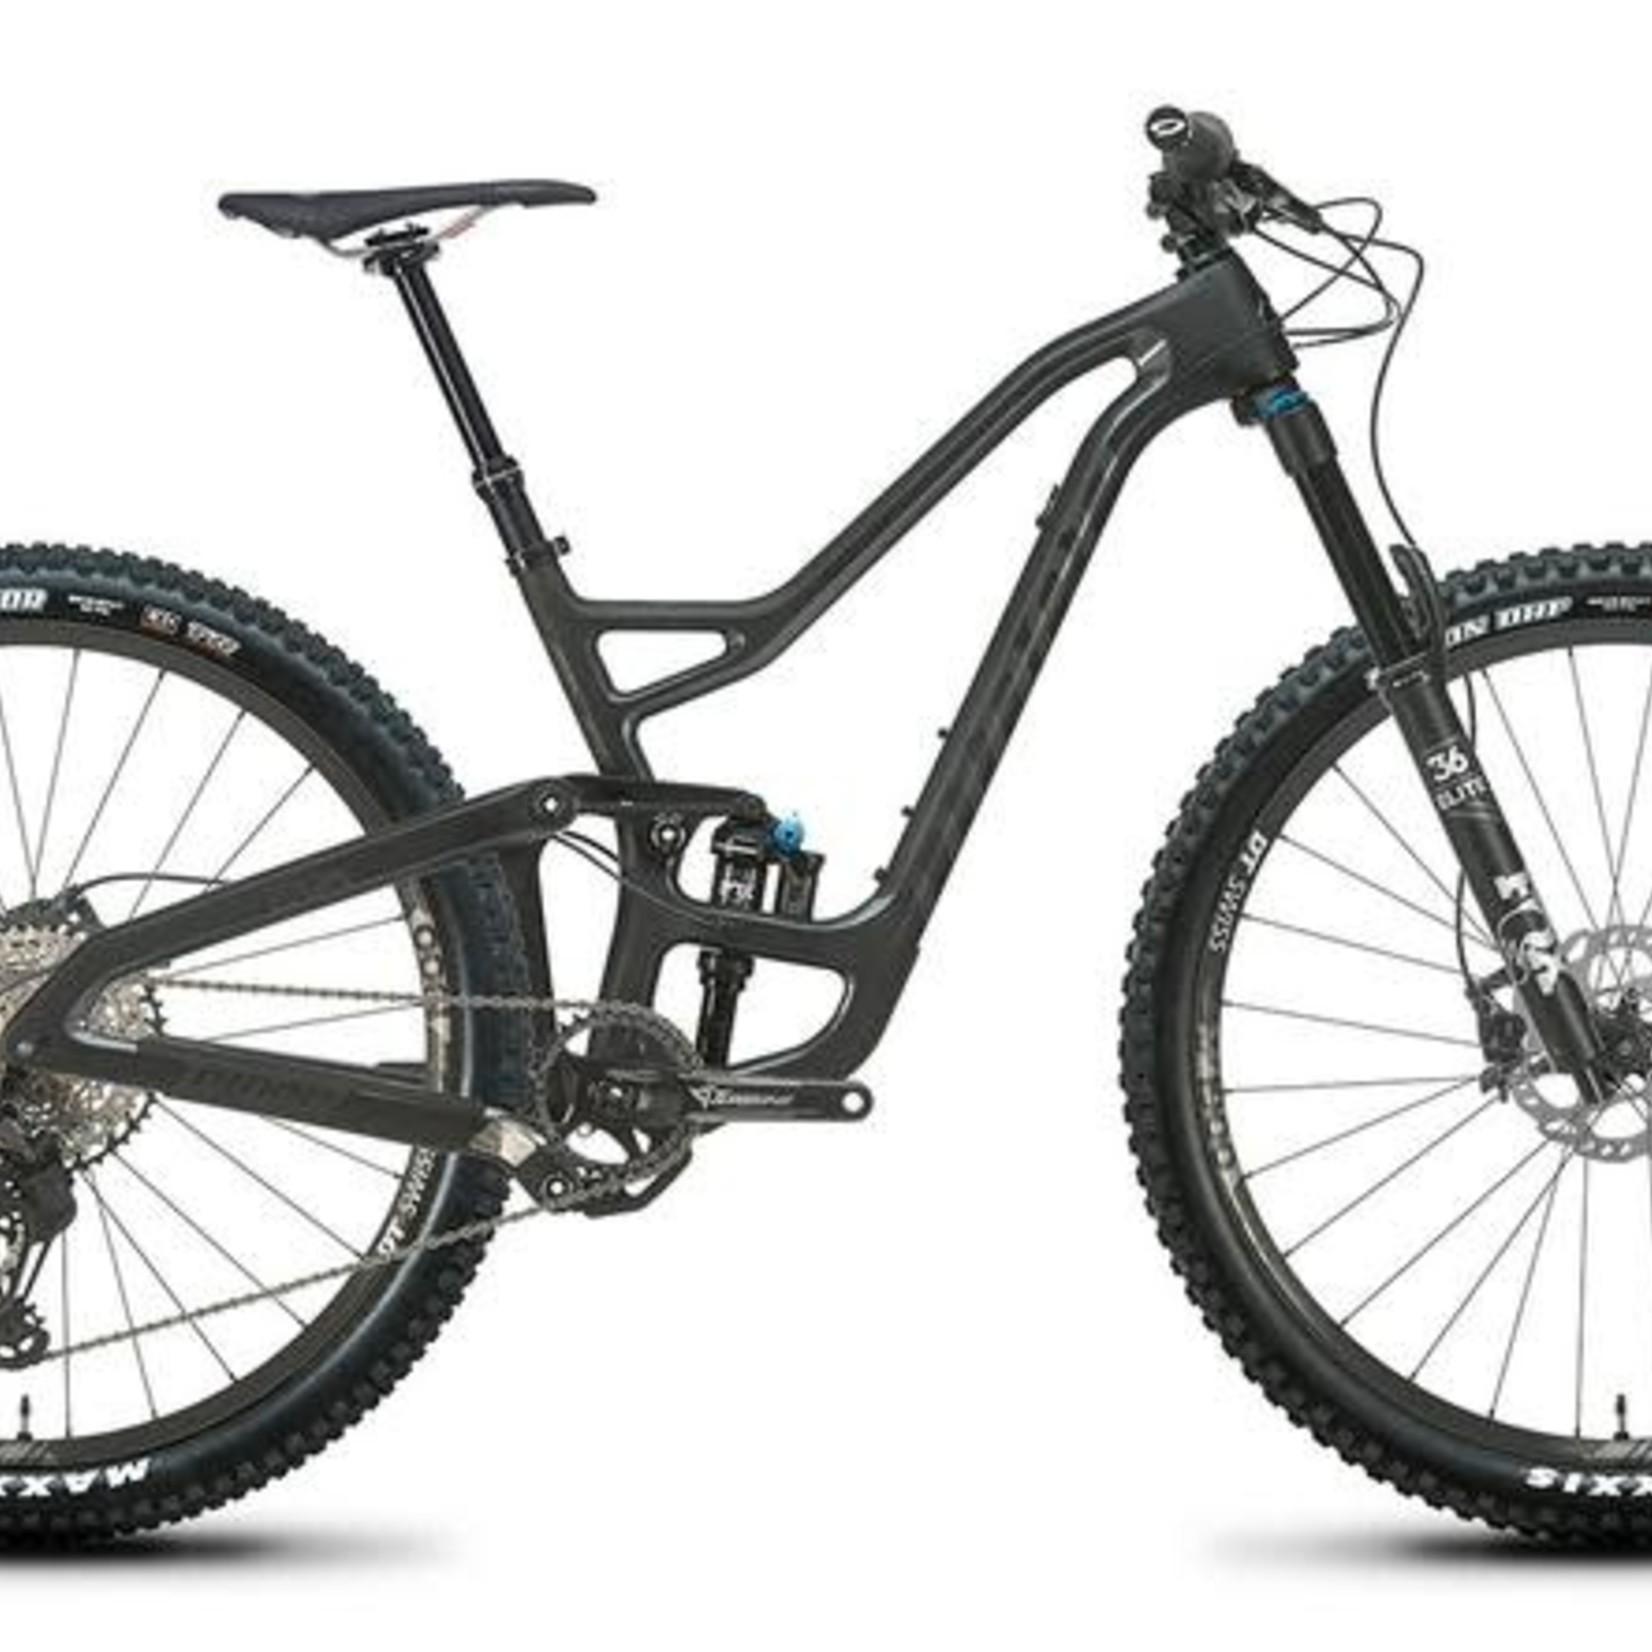 Niner Bikes RIP9RDO 29 3-star Satin Carbon L